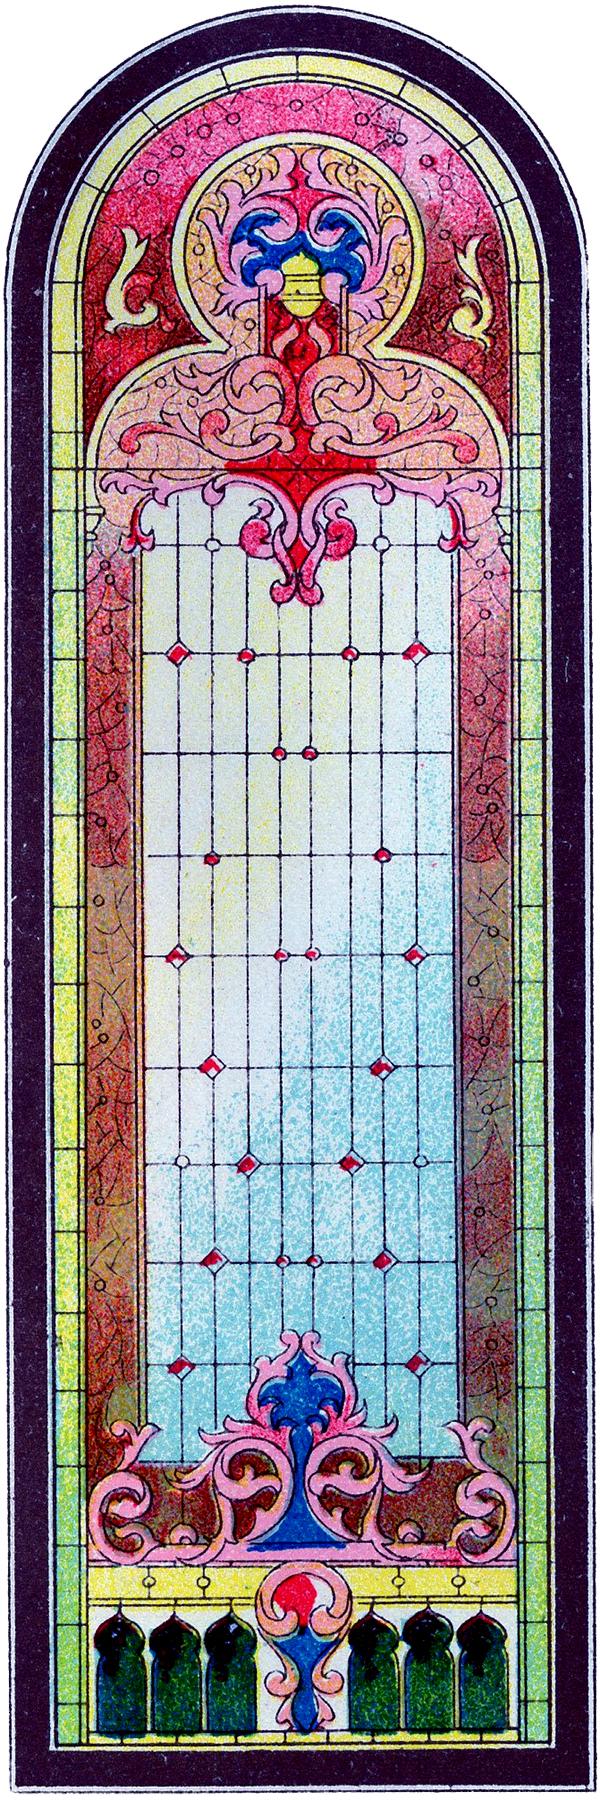 Outline Cartoon Window Stock Illustration - Image: 48711967 |Window Pane Clipart